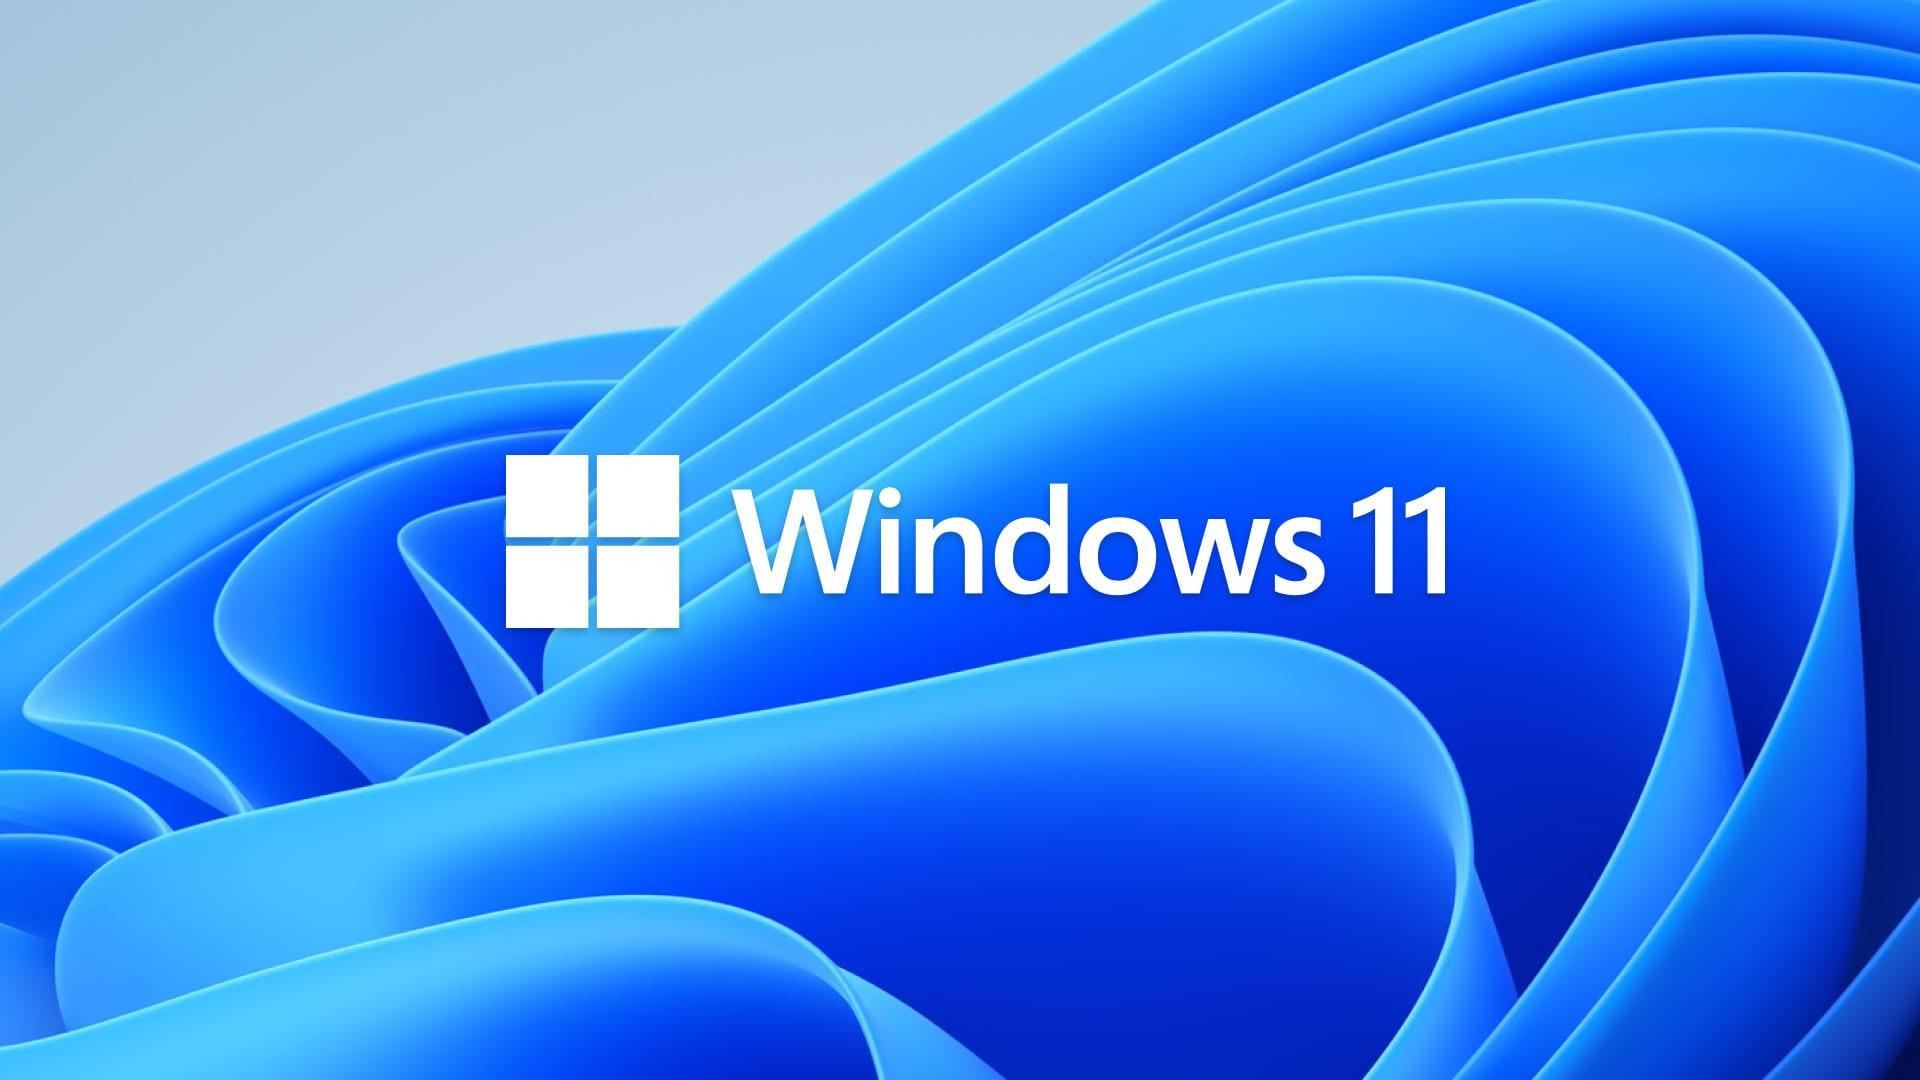 Windows-11-hero-1-1.jpg